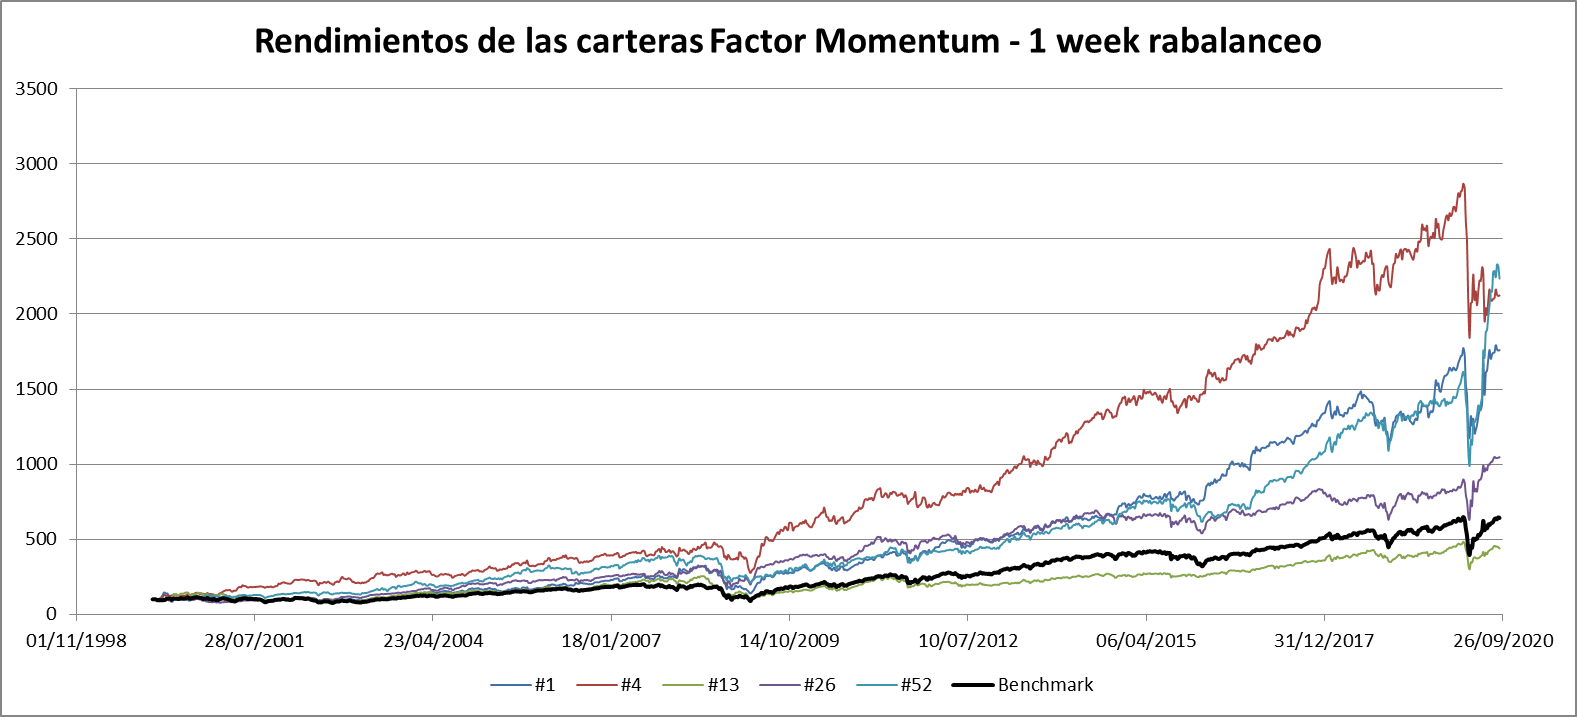 Factor Momentum 1 week rebalanceo